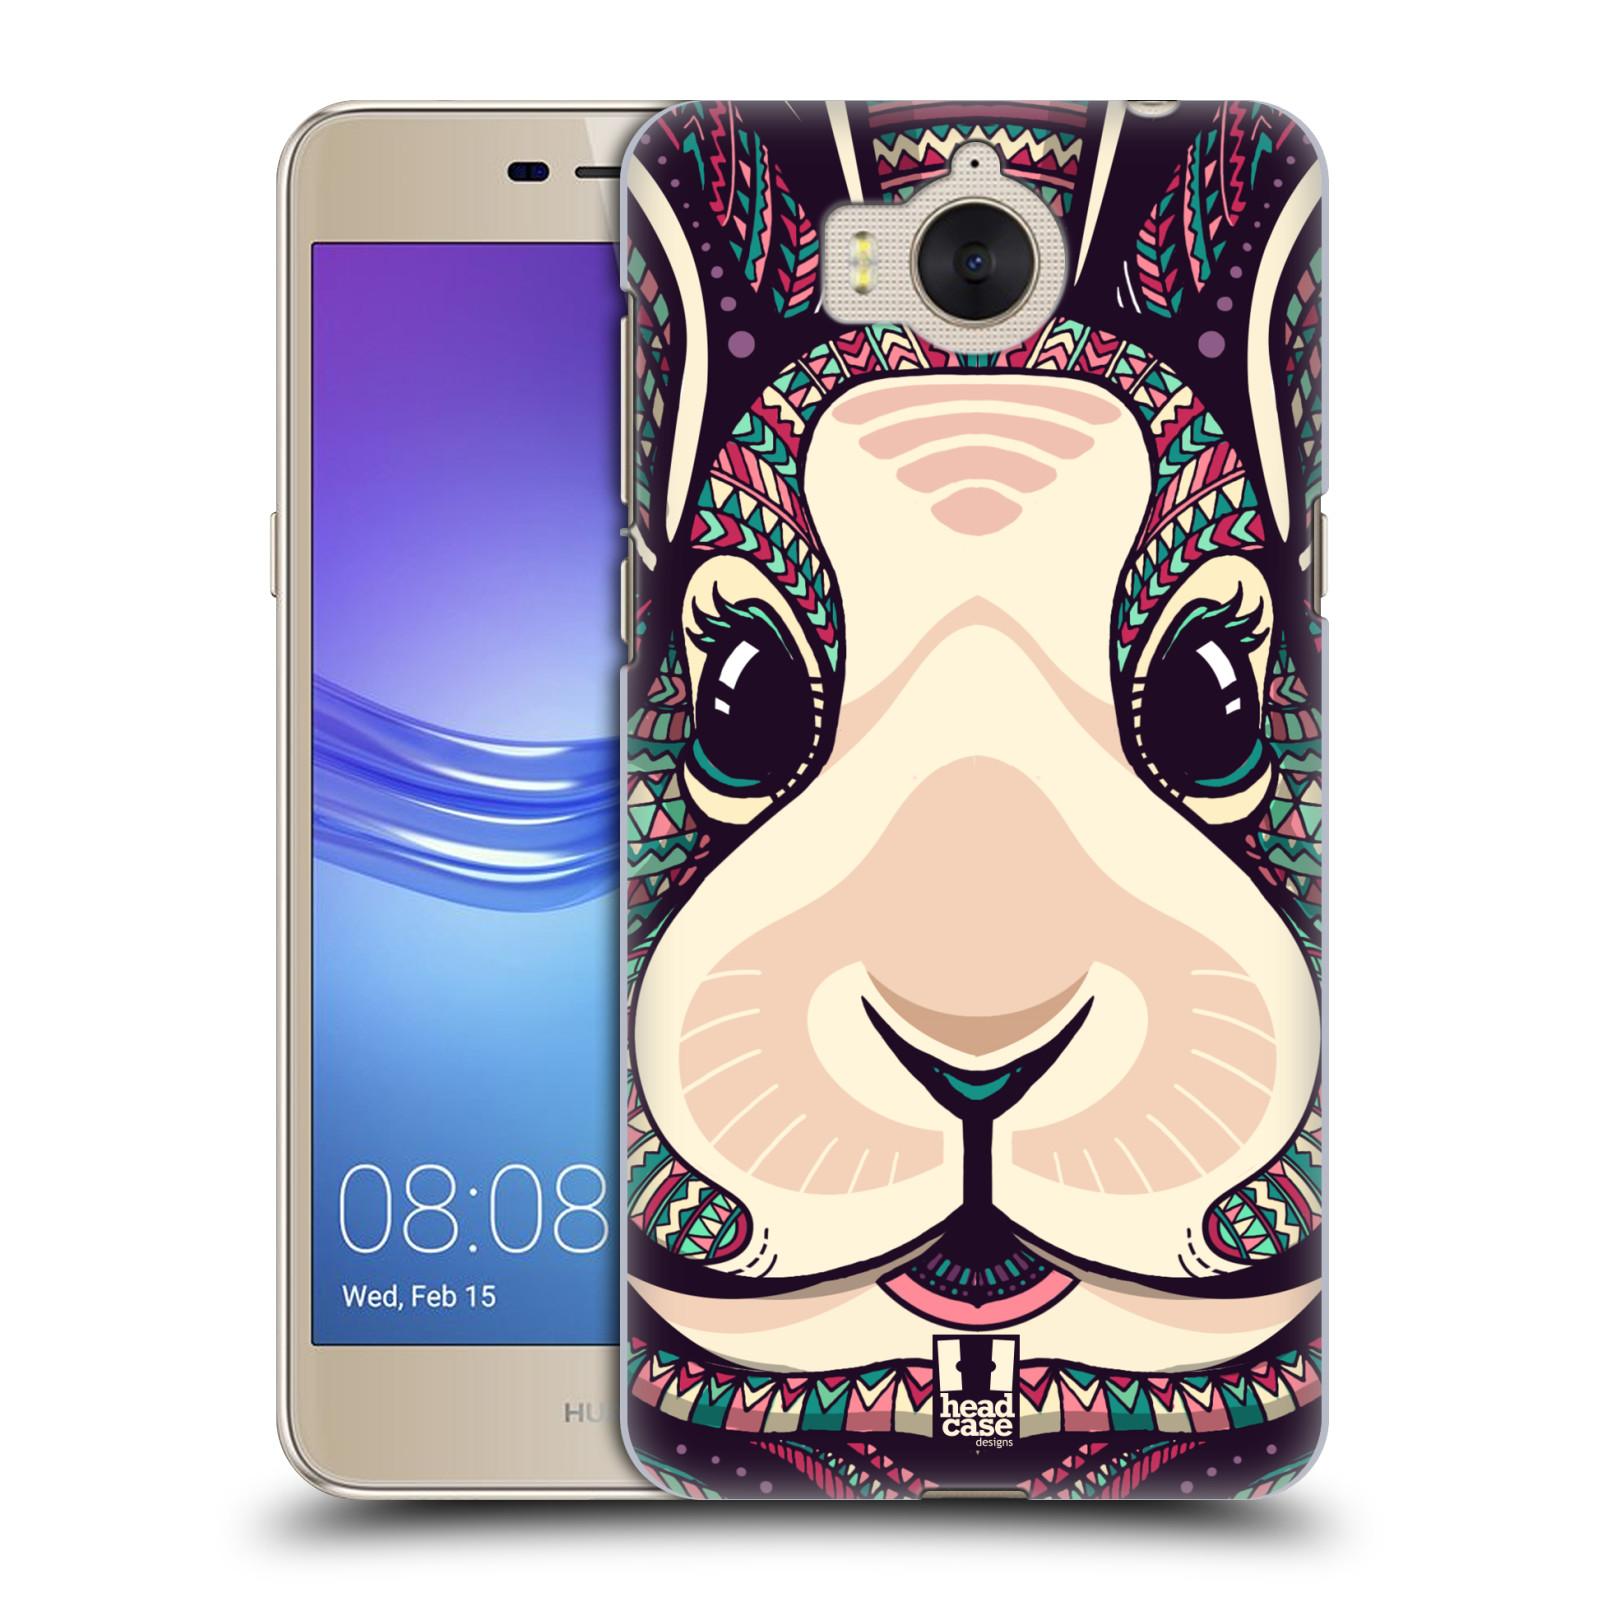 Plastové pouzdro na mobil Huawei Y6 2017 - Head Case - AZTEC ZAJÍČEK